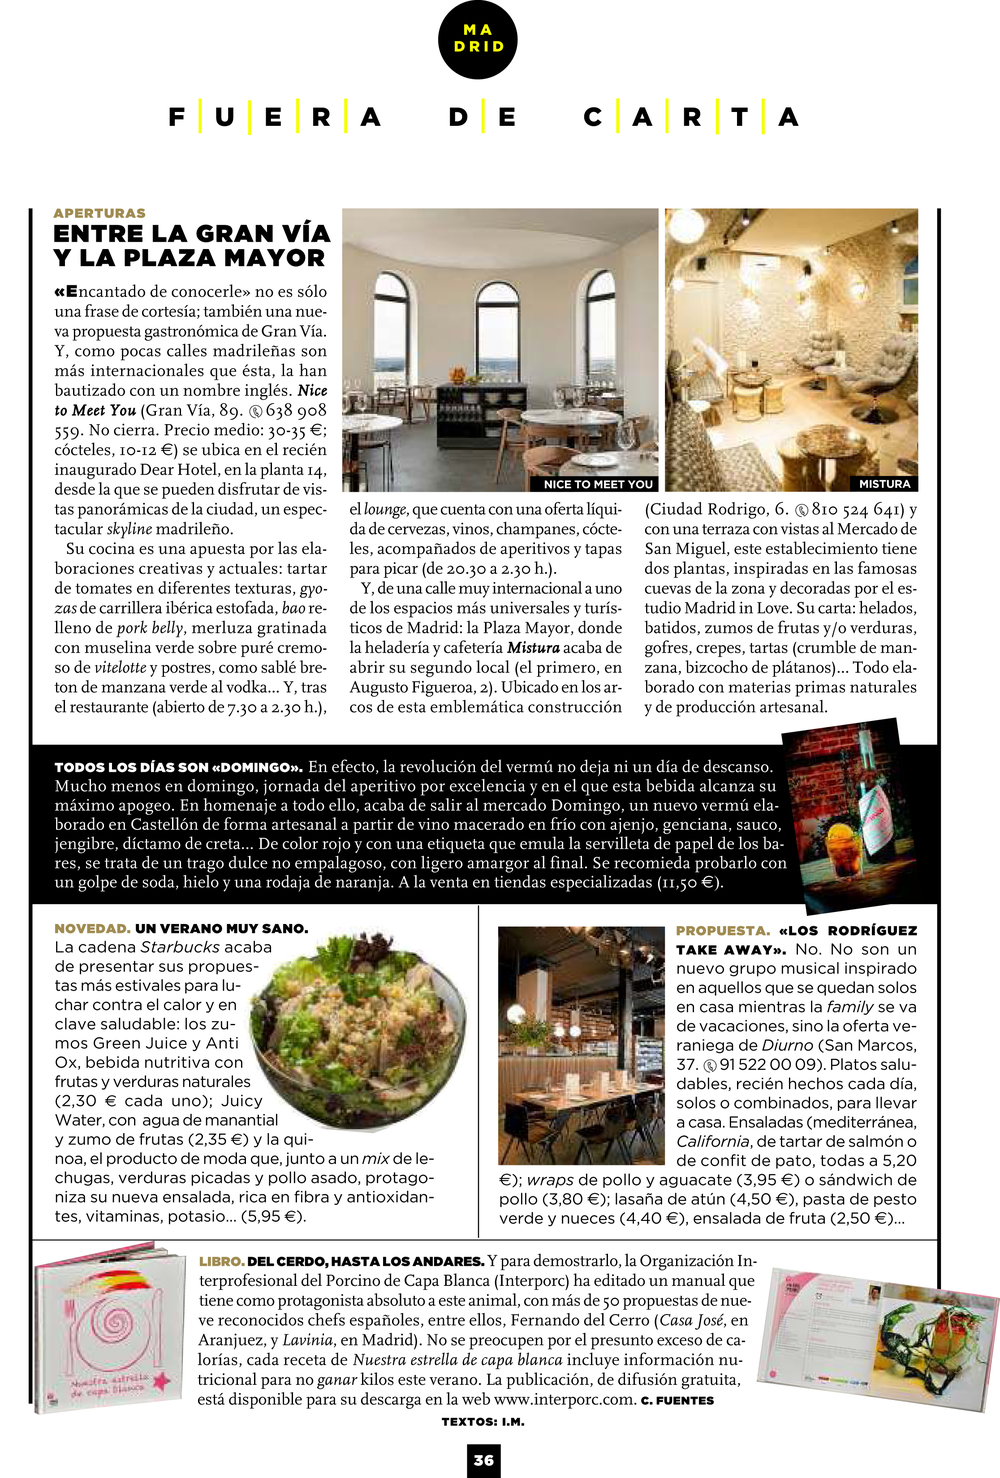 Metropoli pagina Domingo 0708.jpg